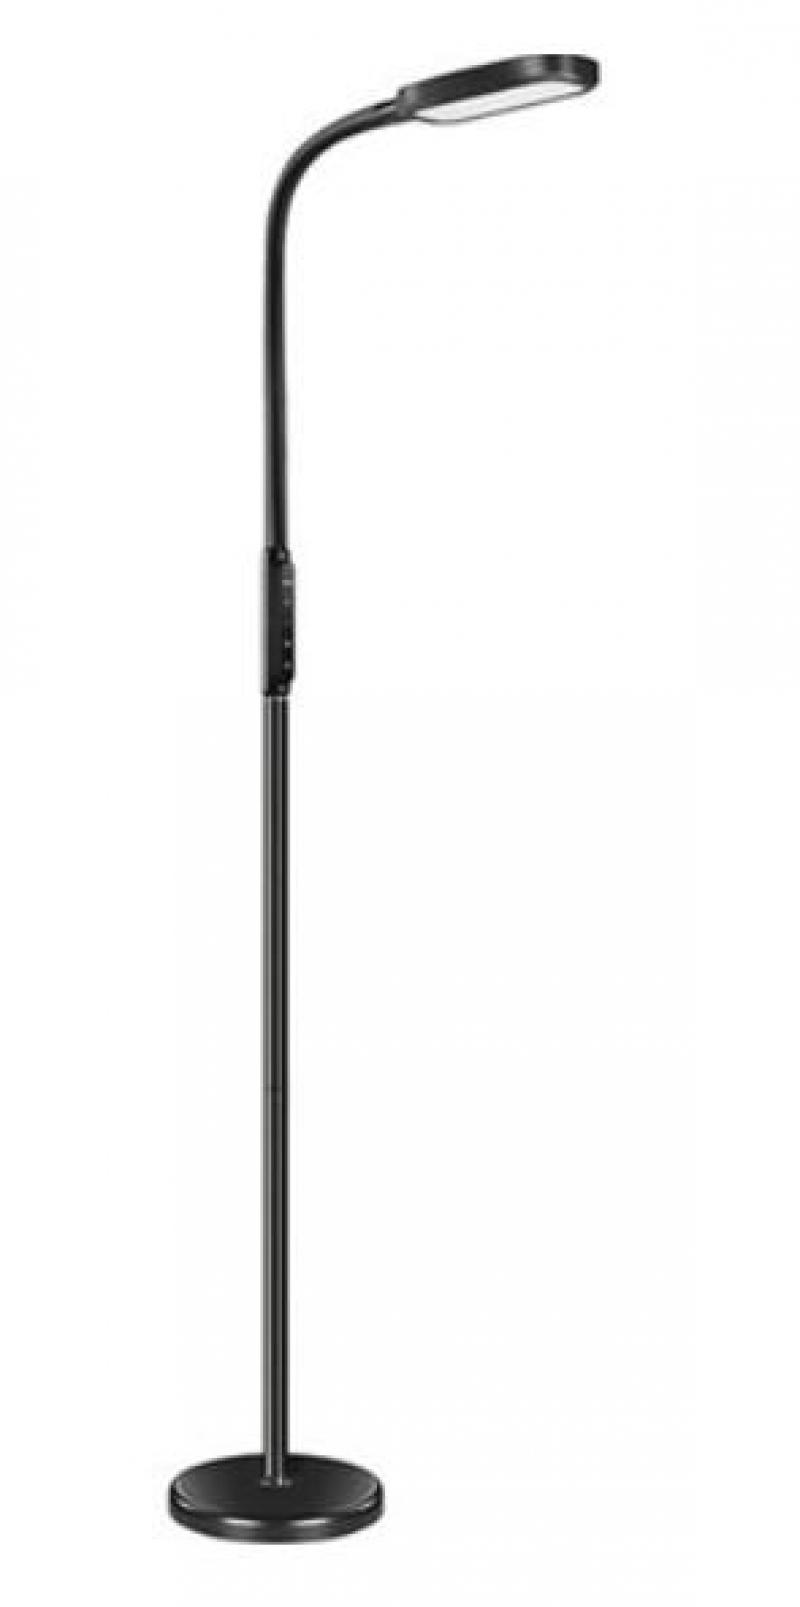 ihocon: Miroco LED Adjustable Floor Lamp w/ 5 Brightness Levels & 3 Color Temperatures 光線微調落地燈